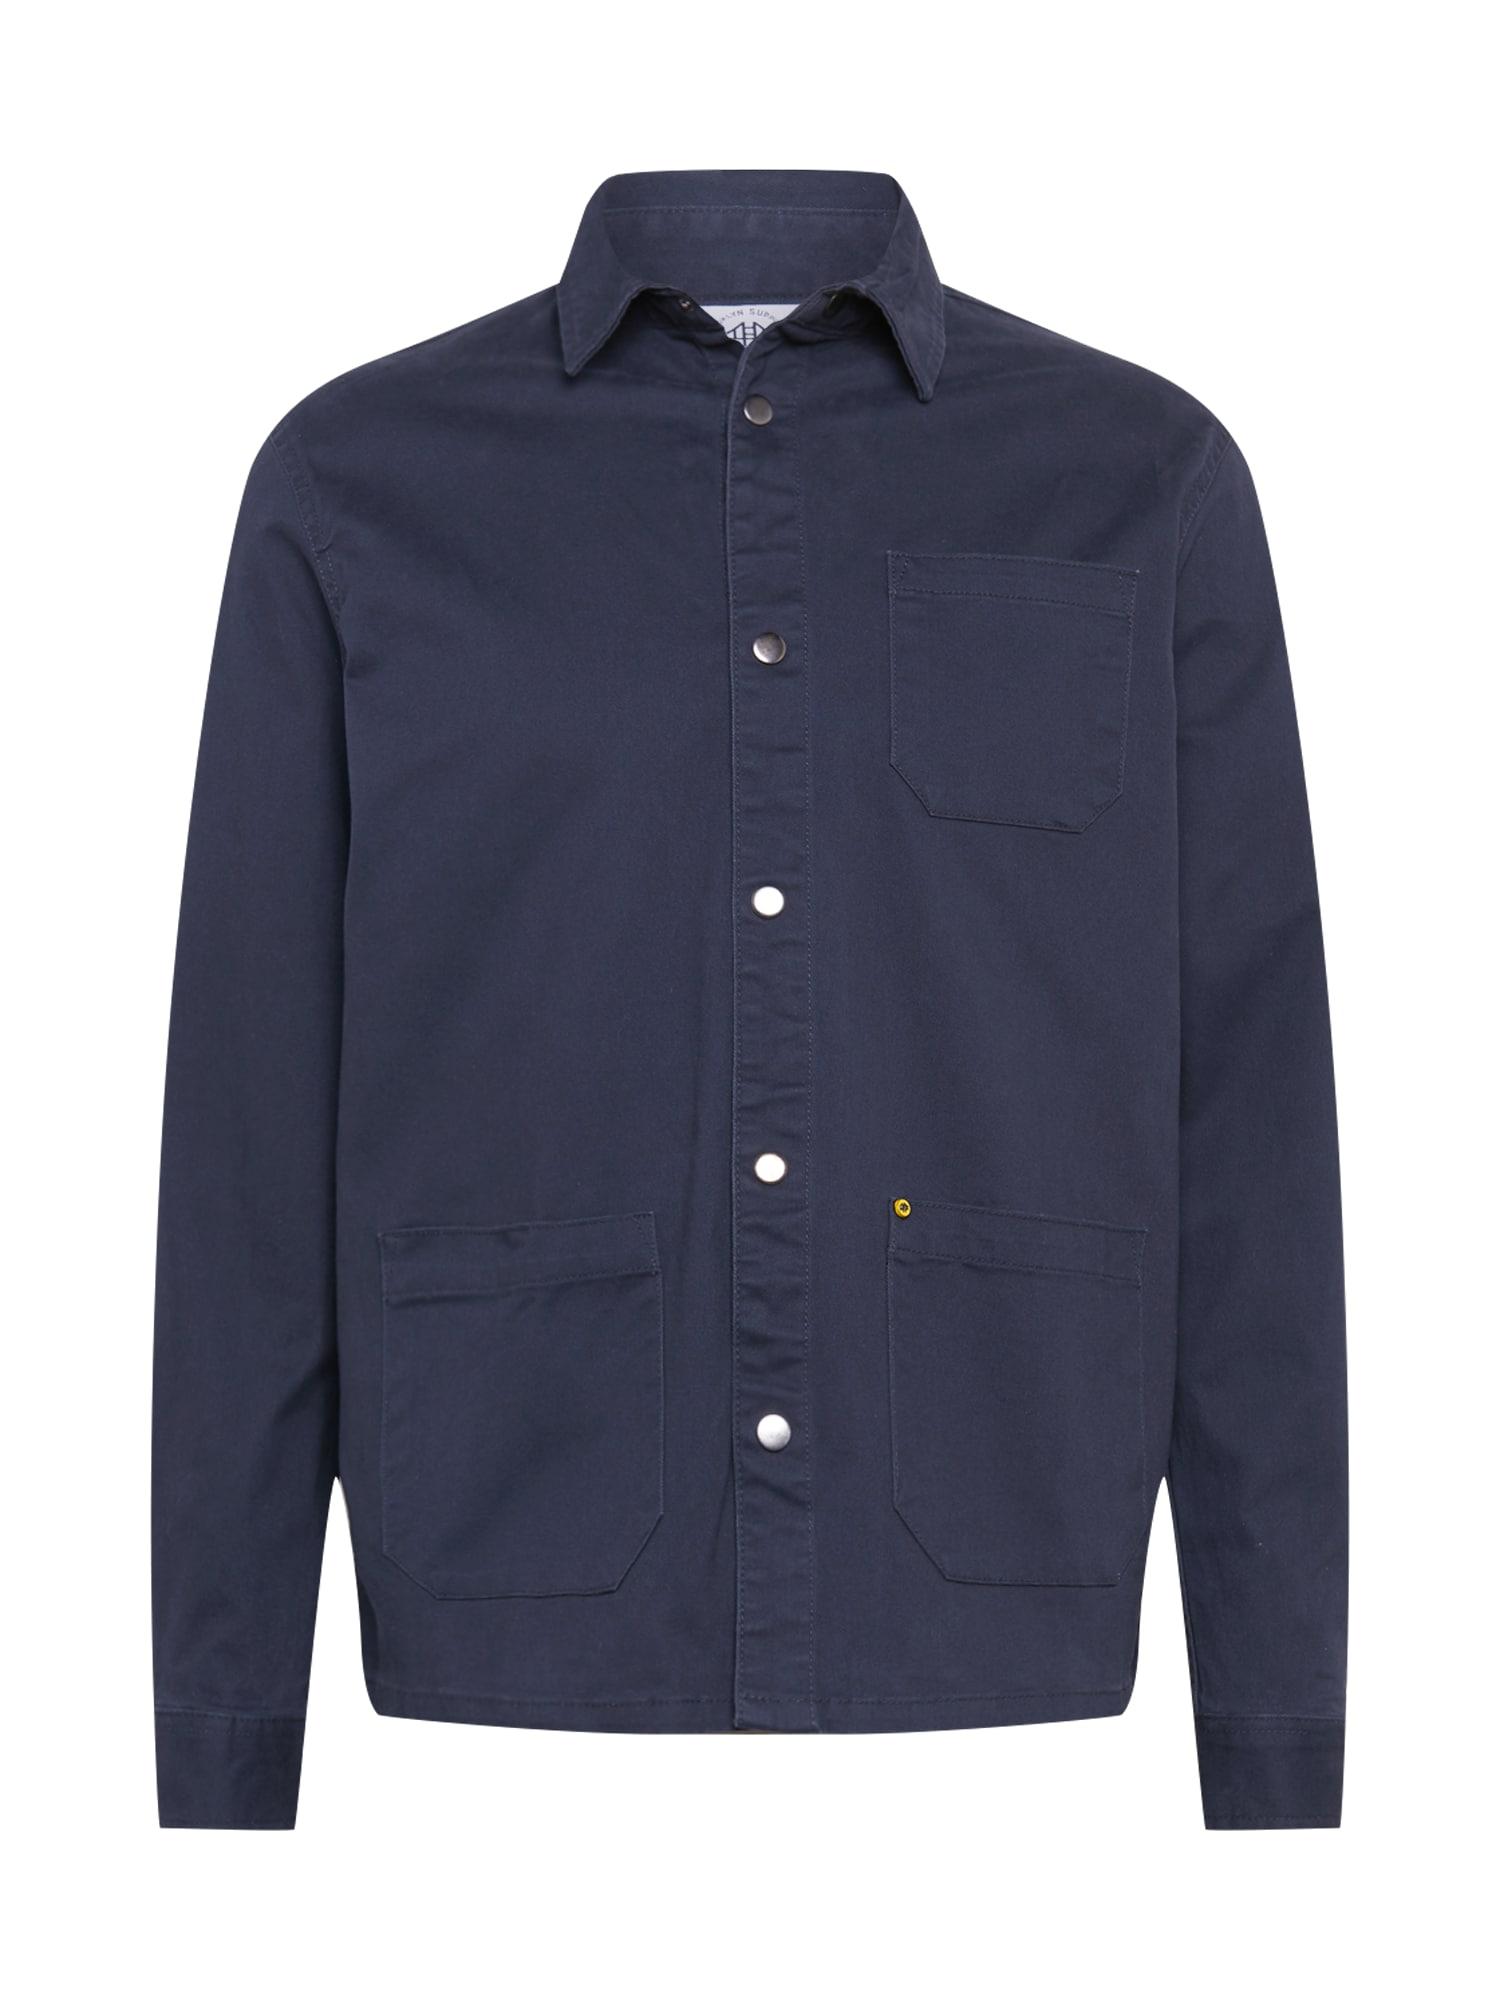 Brooklyn Supply Co. Marškiniai tamsiai mėlyna